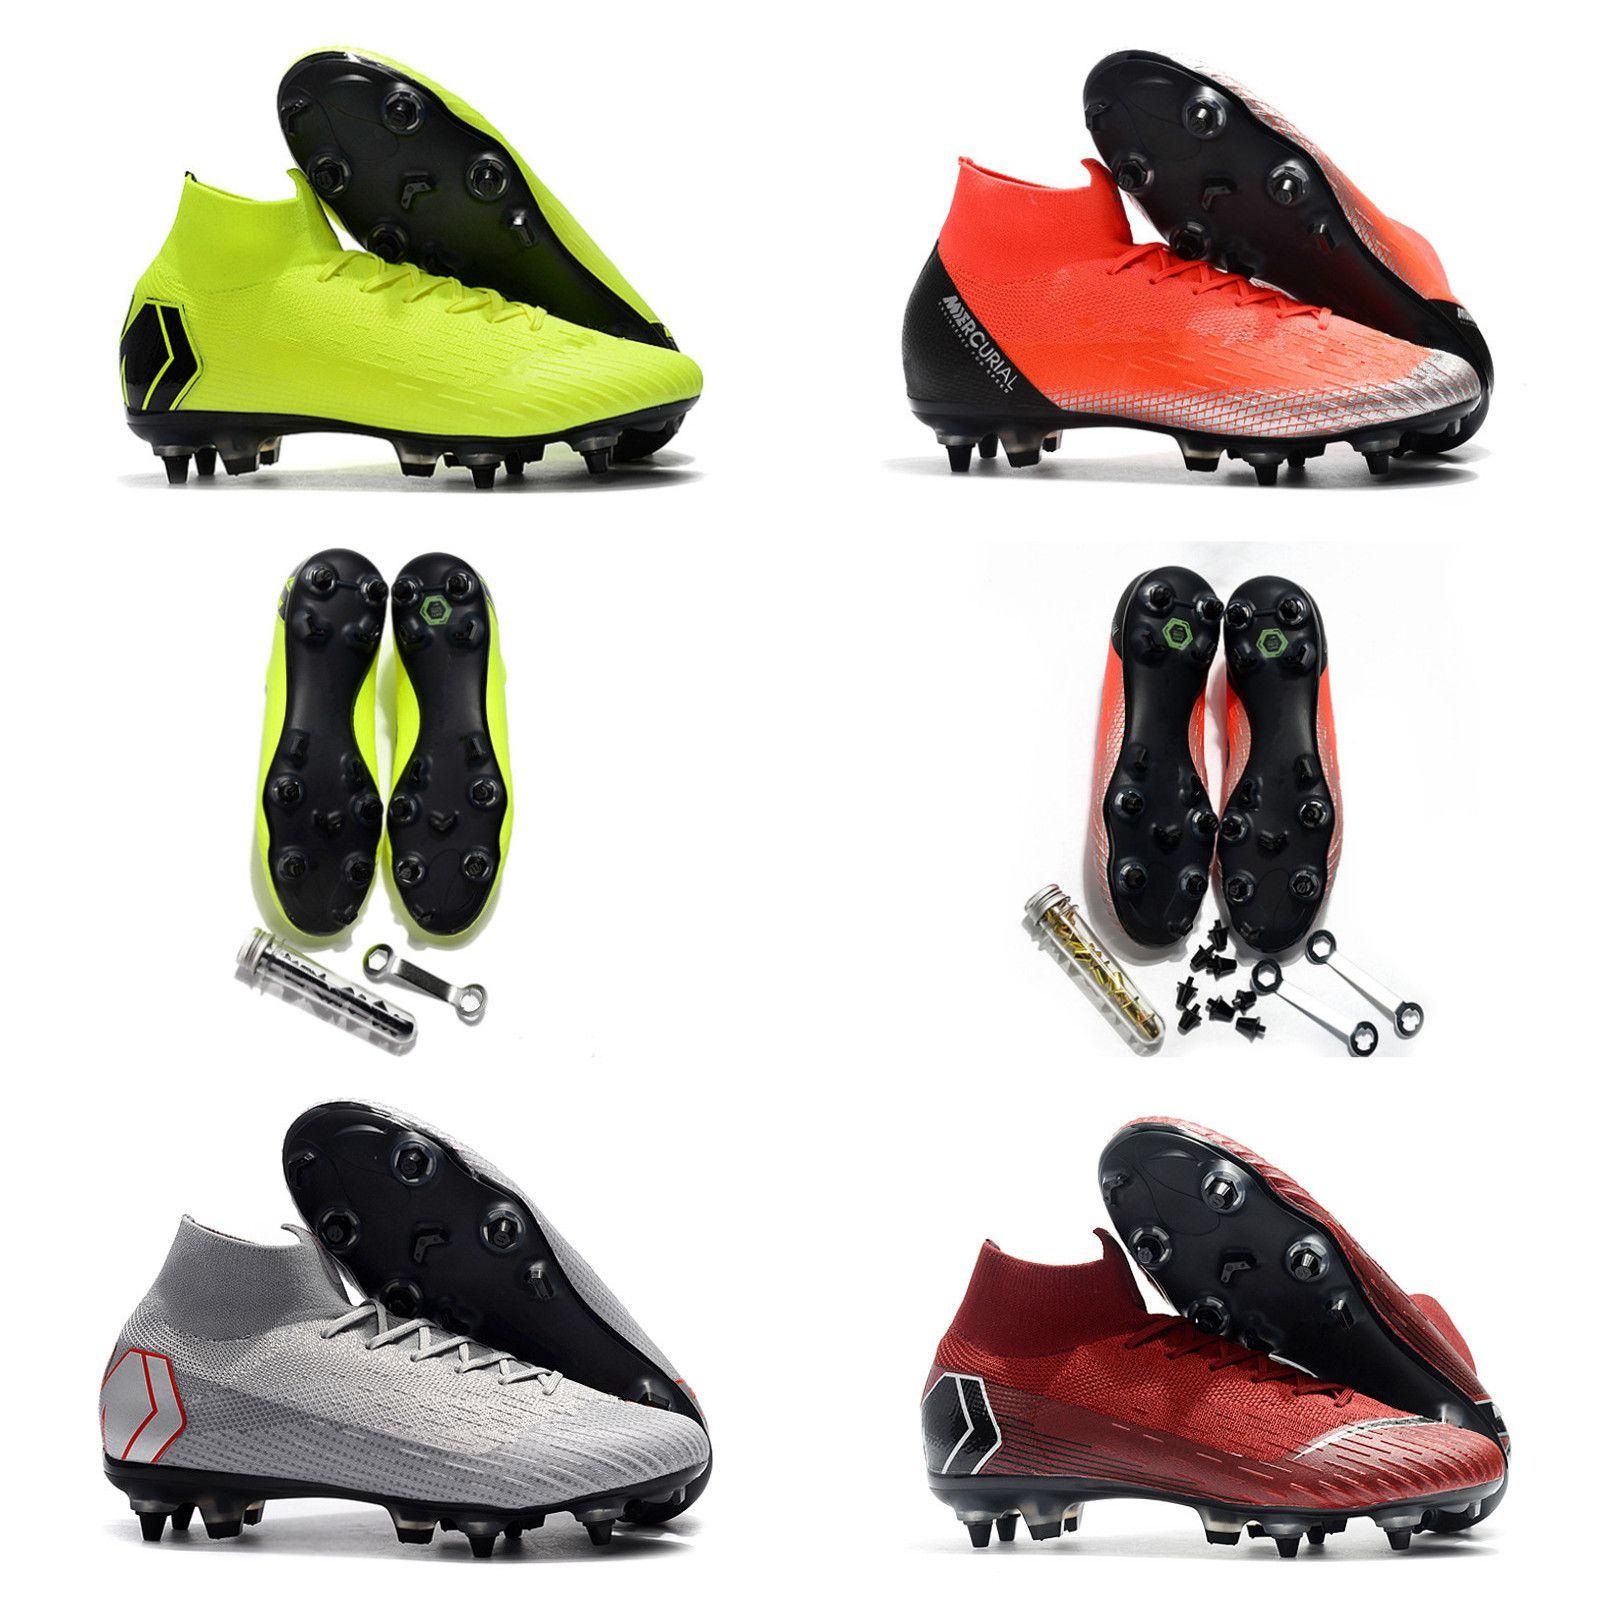 best service 30903 c500b Tacos de fútbol para hombre Mercurial Superfly VI Elite CR7 SG AC Picos de  acero Fluorescentes verde chino Rojo Alto Zapatos de fútbol tamaño EUR39-45